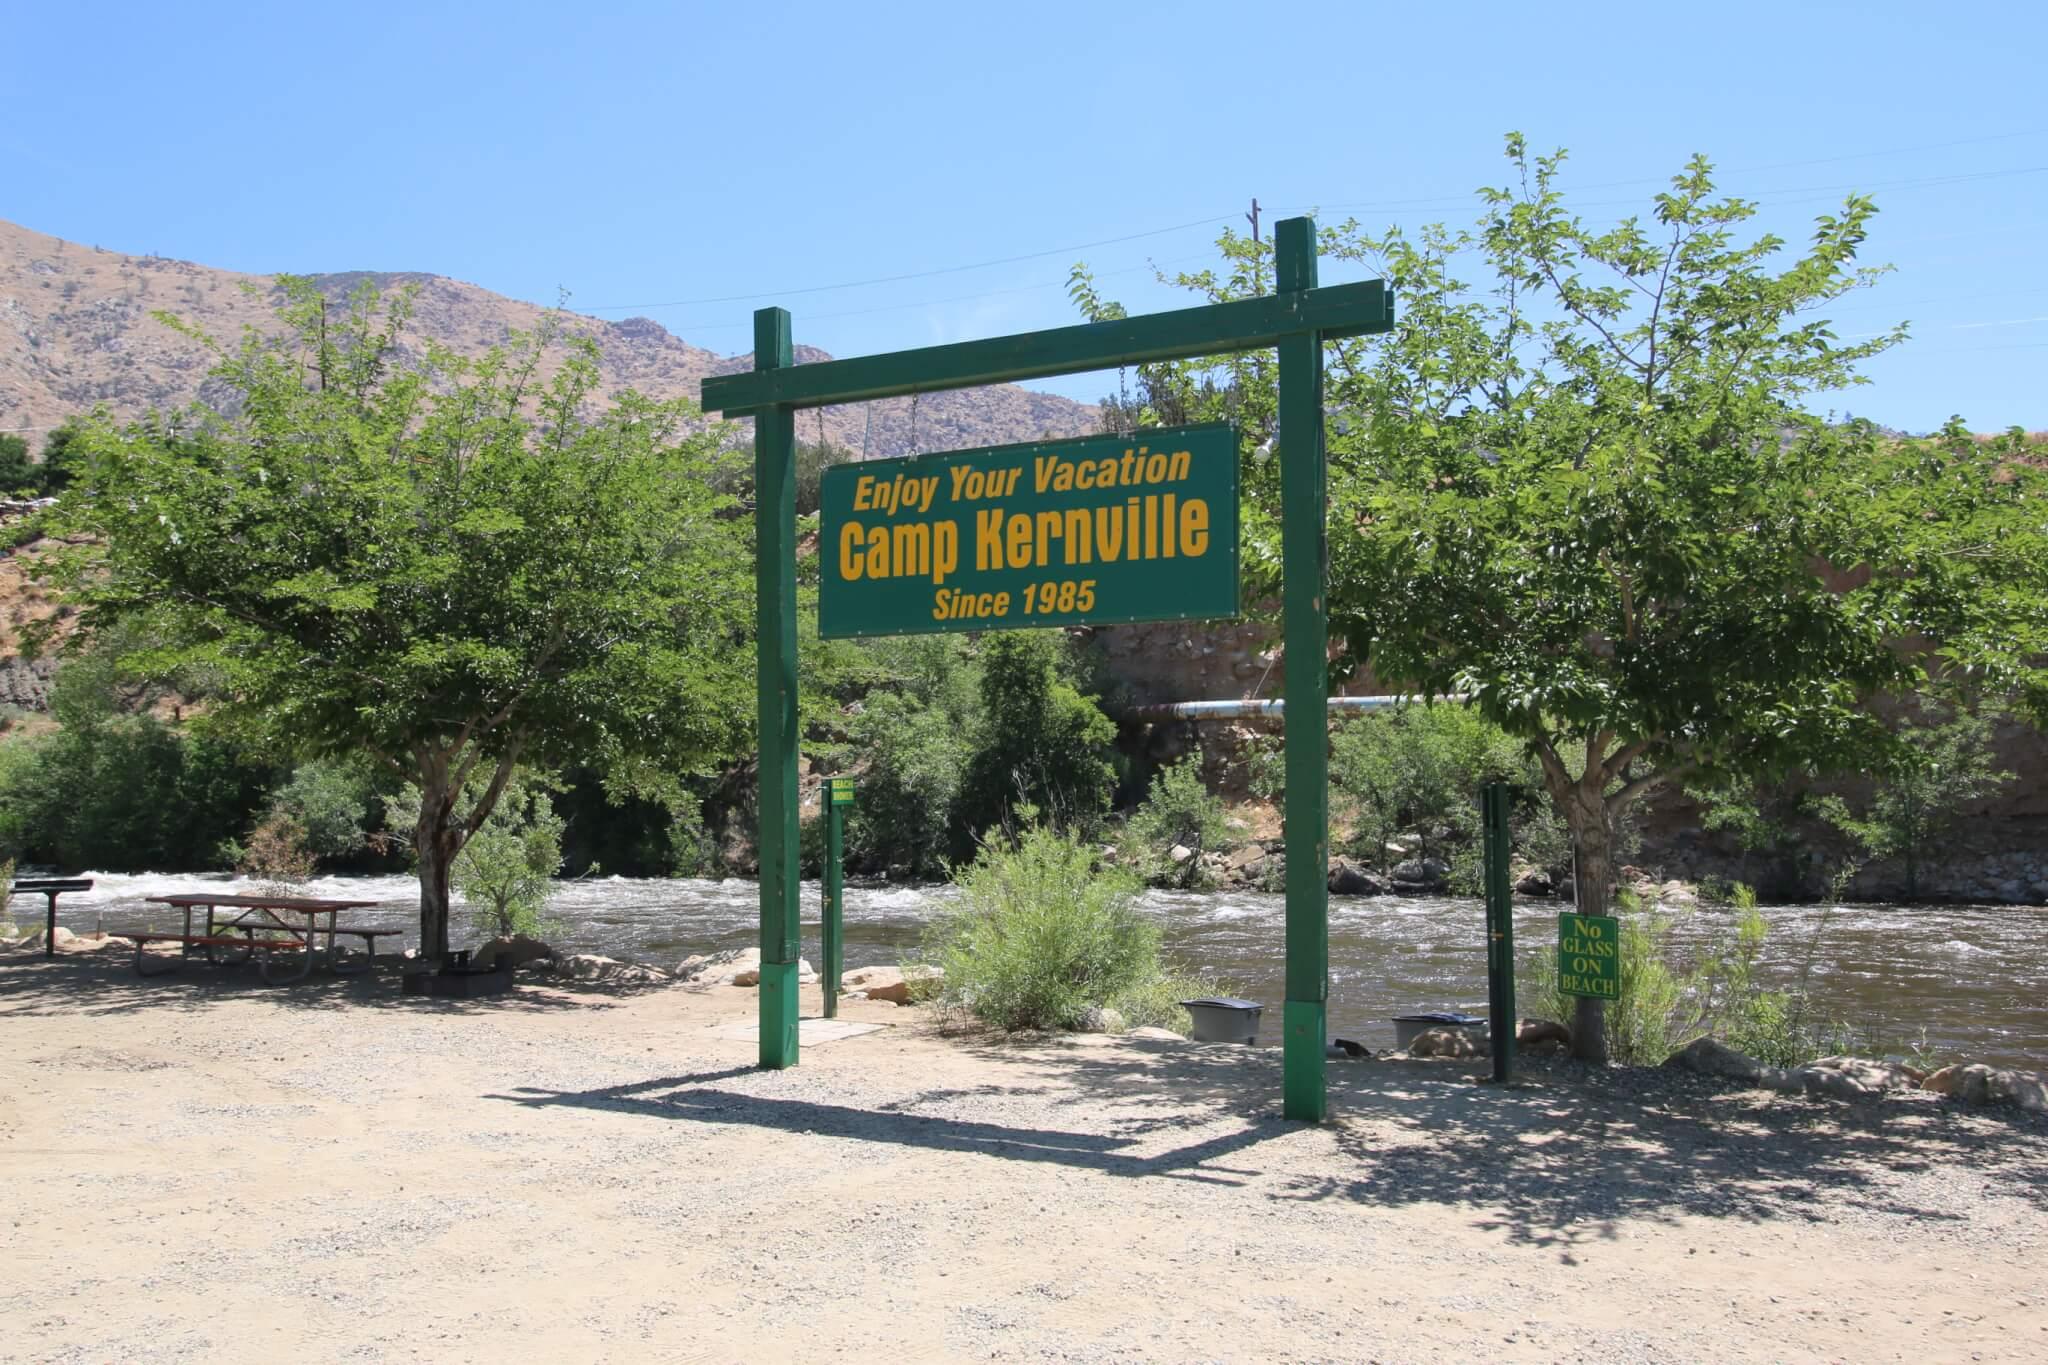 Kern River Campgrounds - Camp Kernville